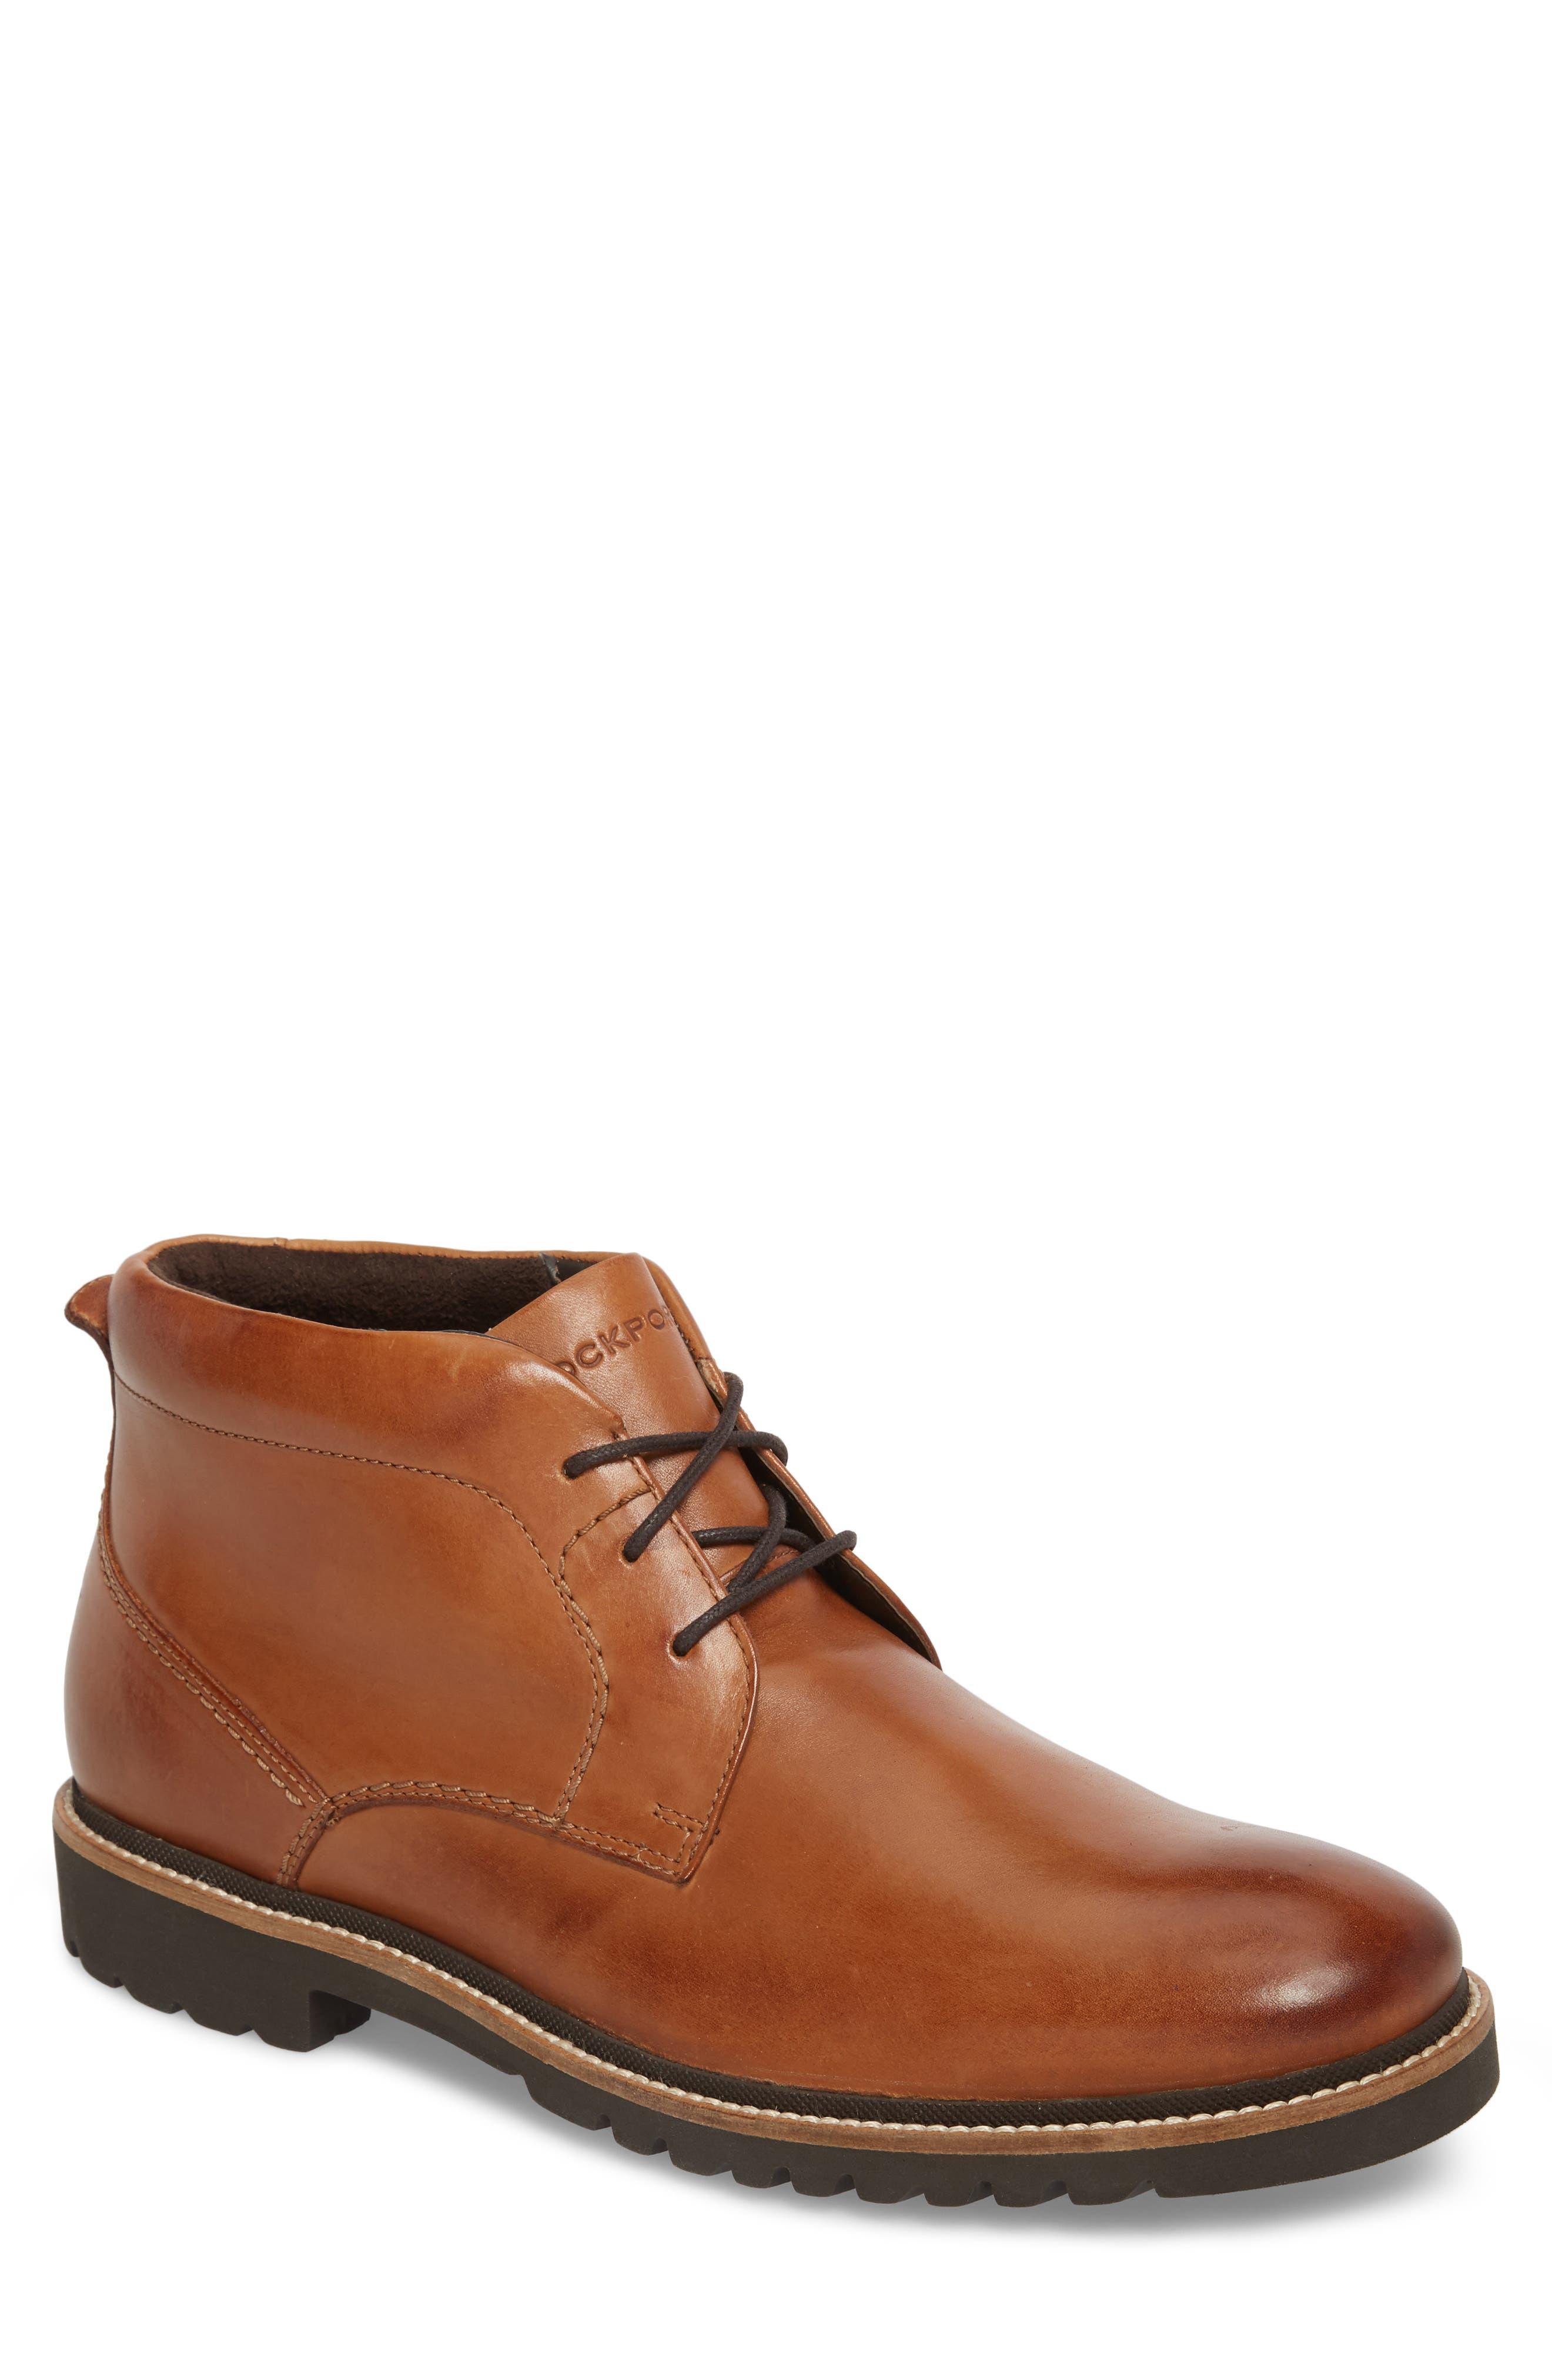 Marshall Chukka Boot,                             Main thumbnail 1, color,                             Cognac Leather